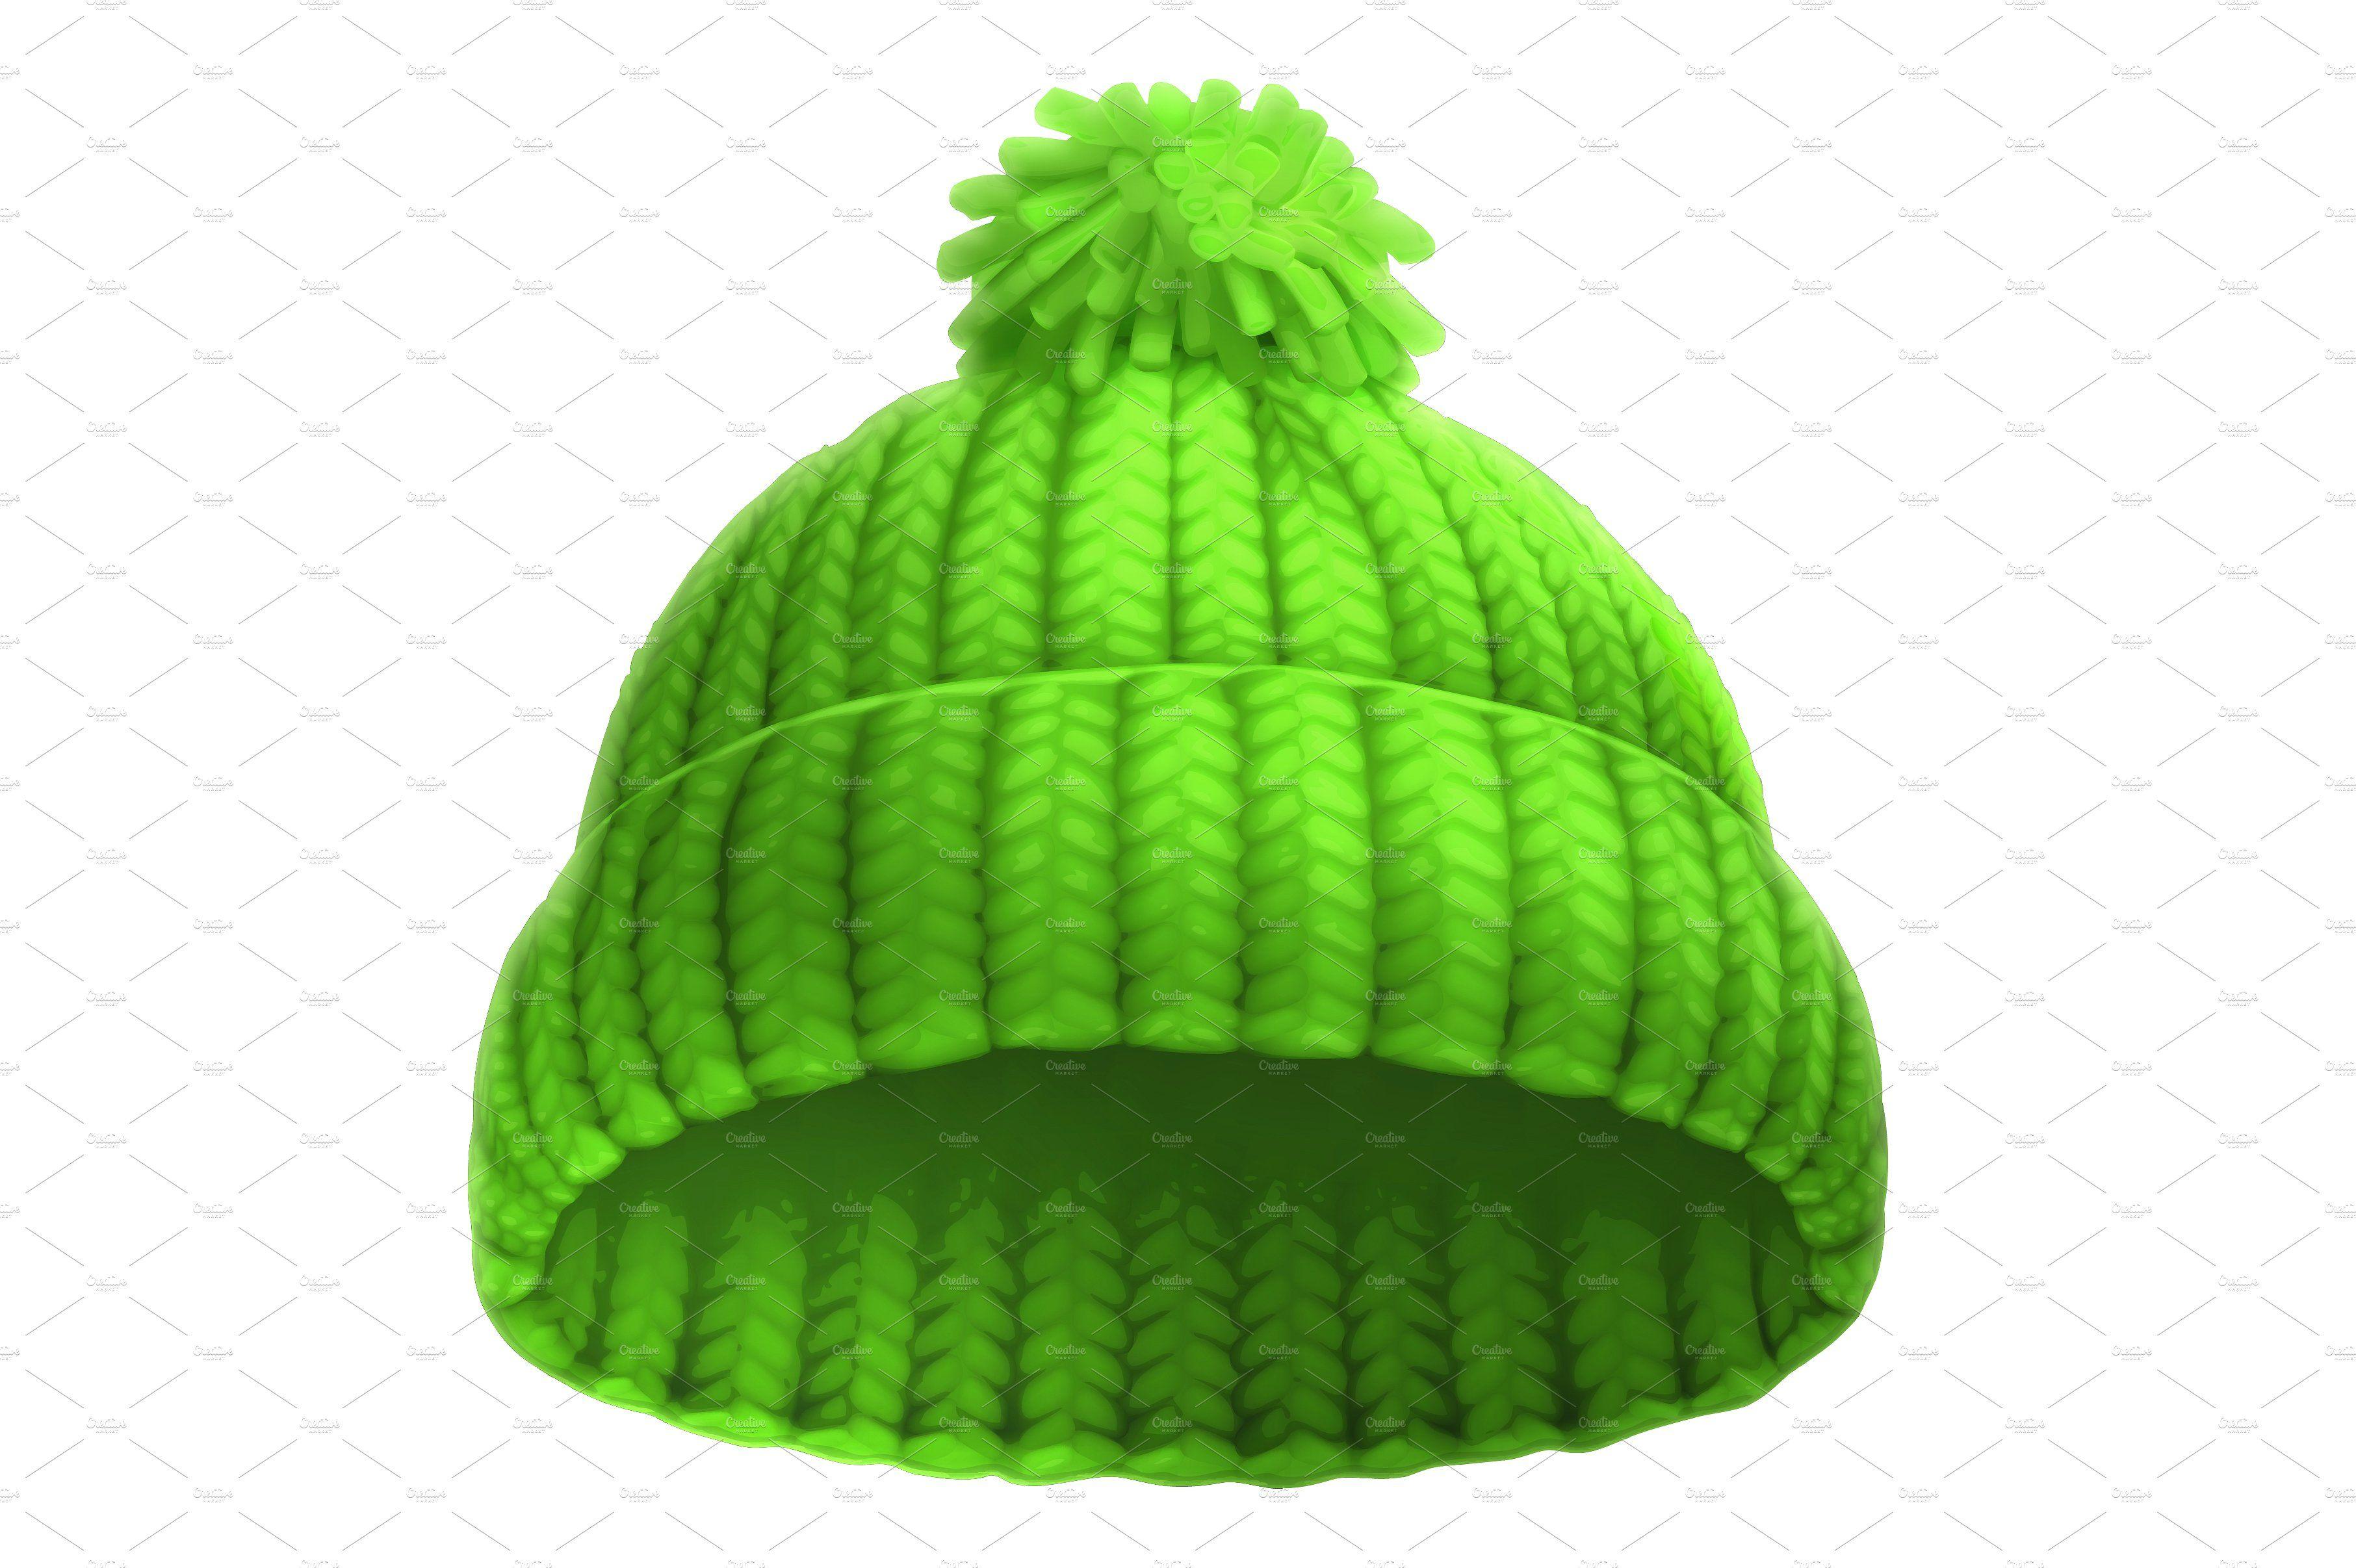 Merry Christmas Santa Claus Vector Scrapbook Images Winter Knit Hats Winter Hats